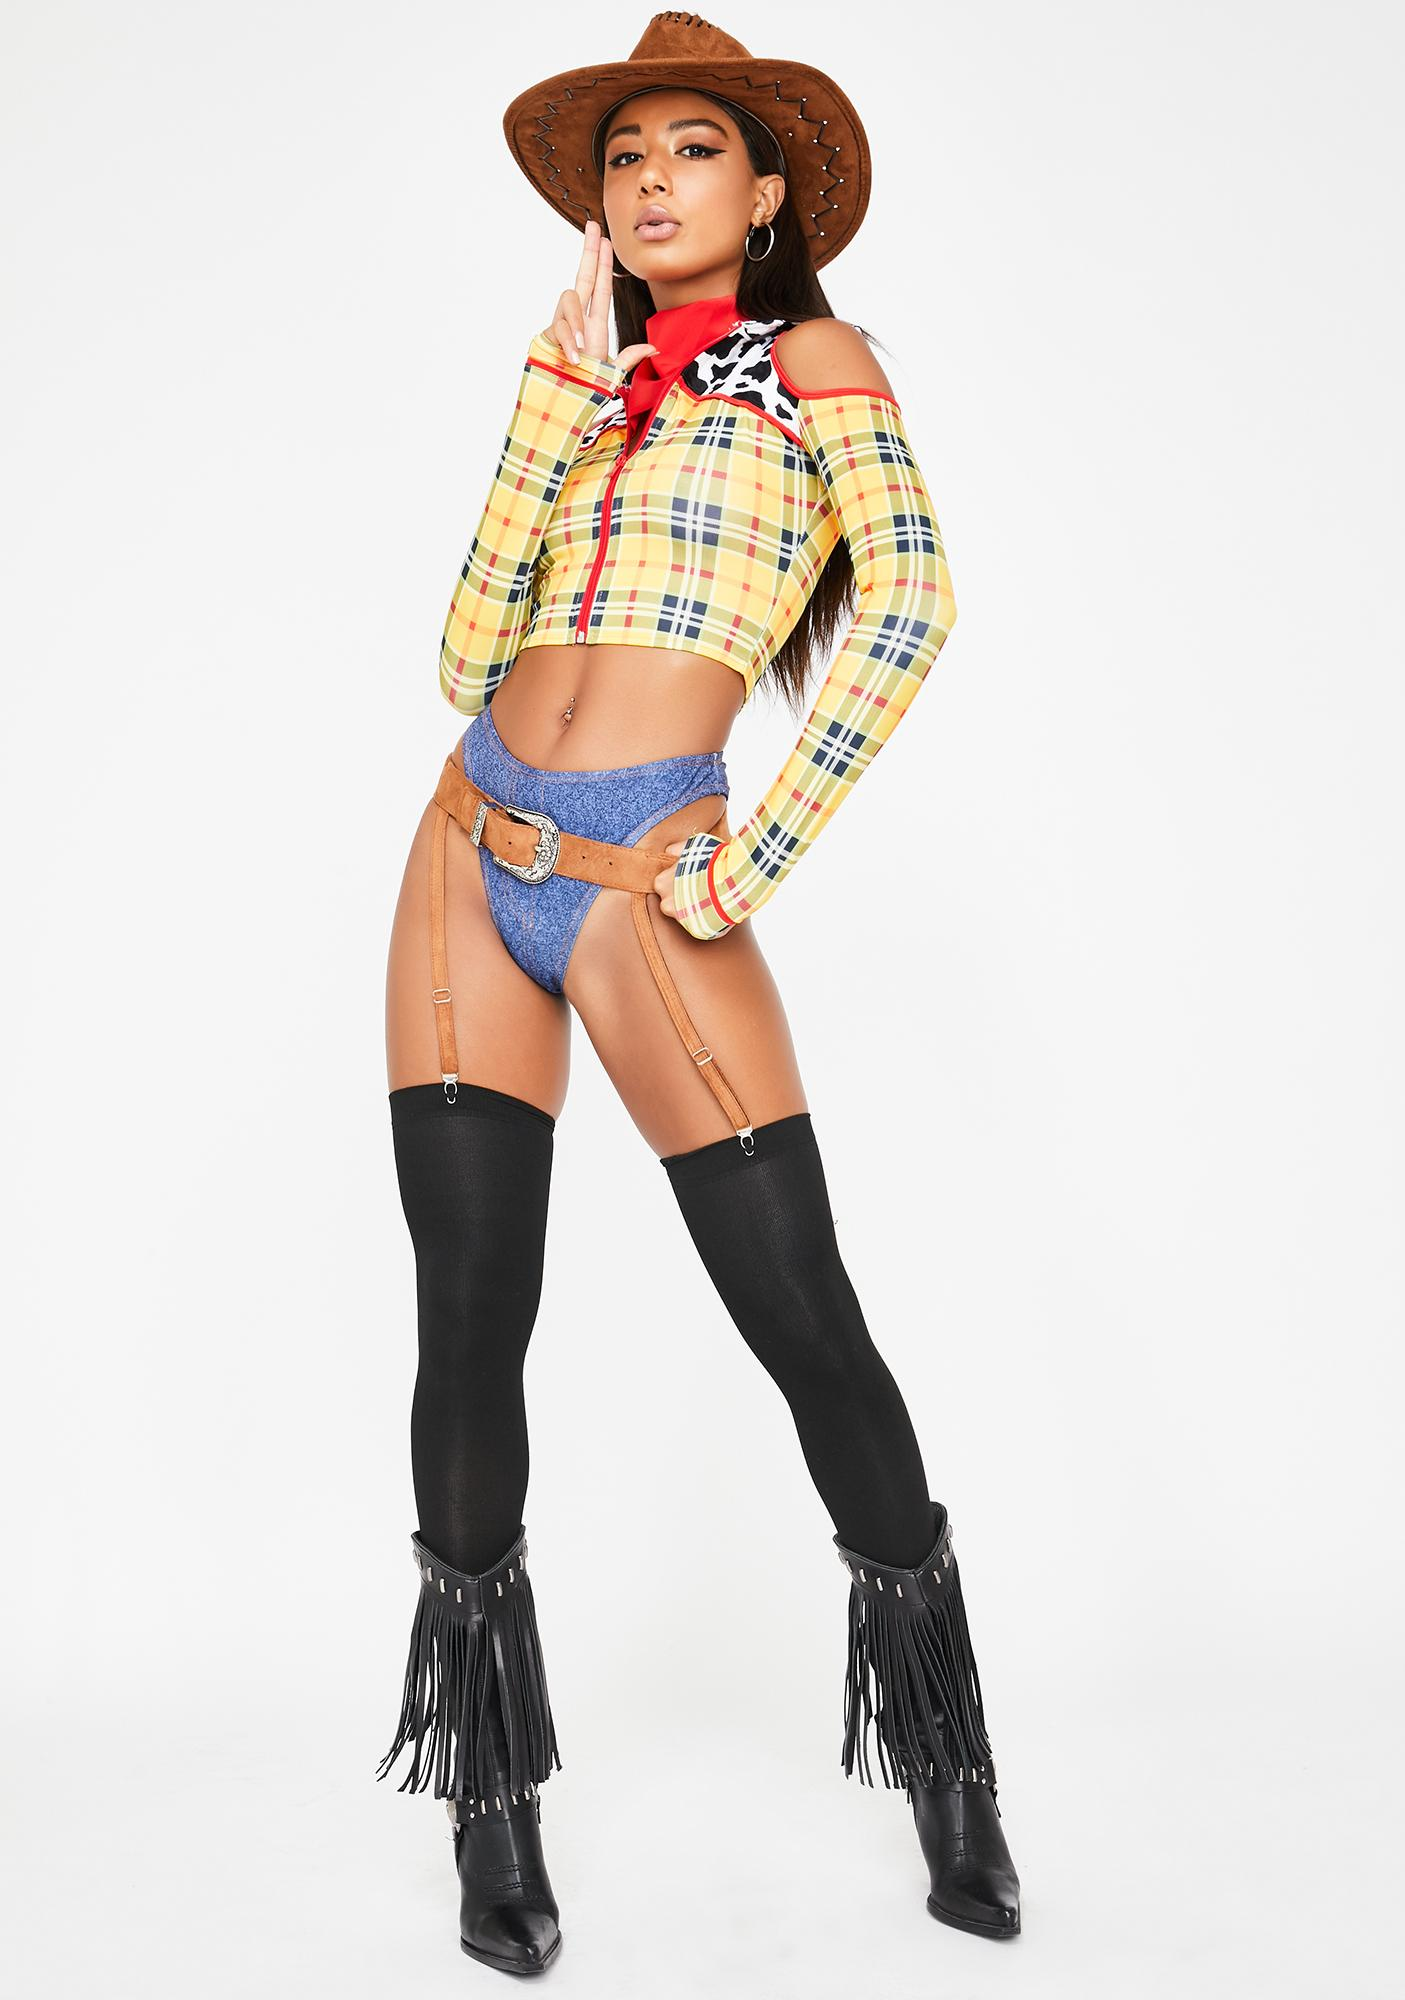 Playtime Sheriff Costume Set